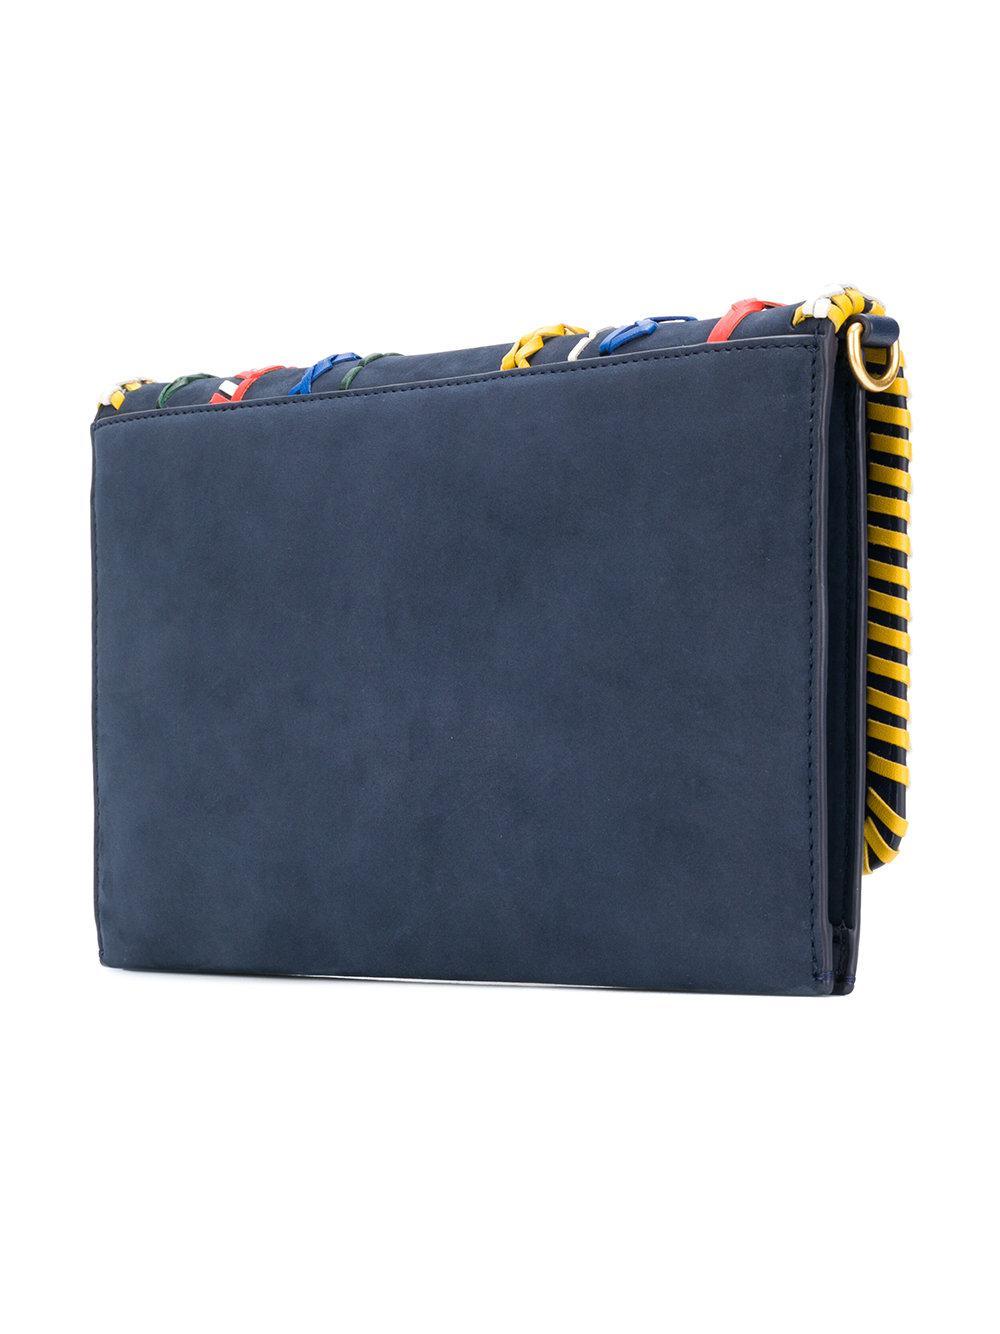 fd1fb42355d662 Lyst - Pochette Kira Tory Burch en coloris Bleu